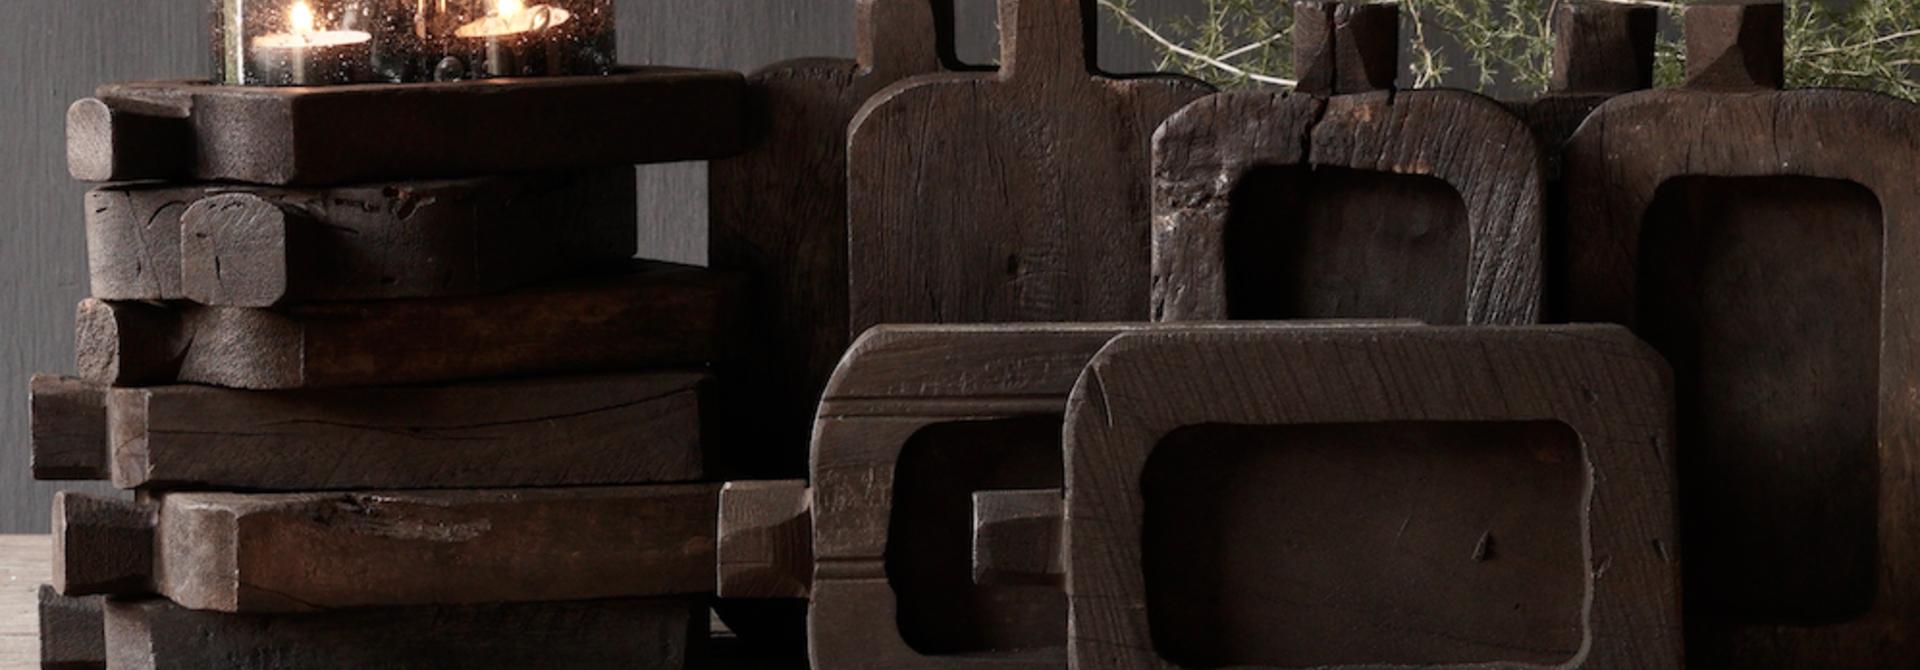 Kleines Regal handgefertigt aus altem Altholz